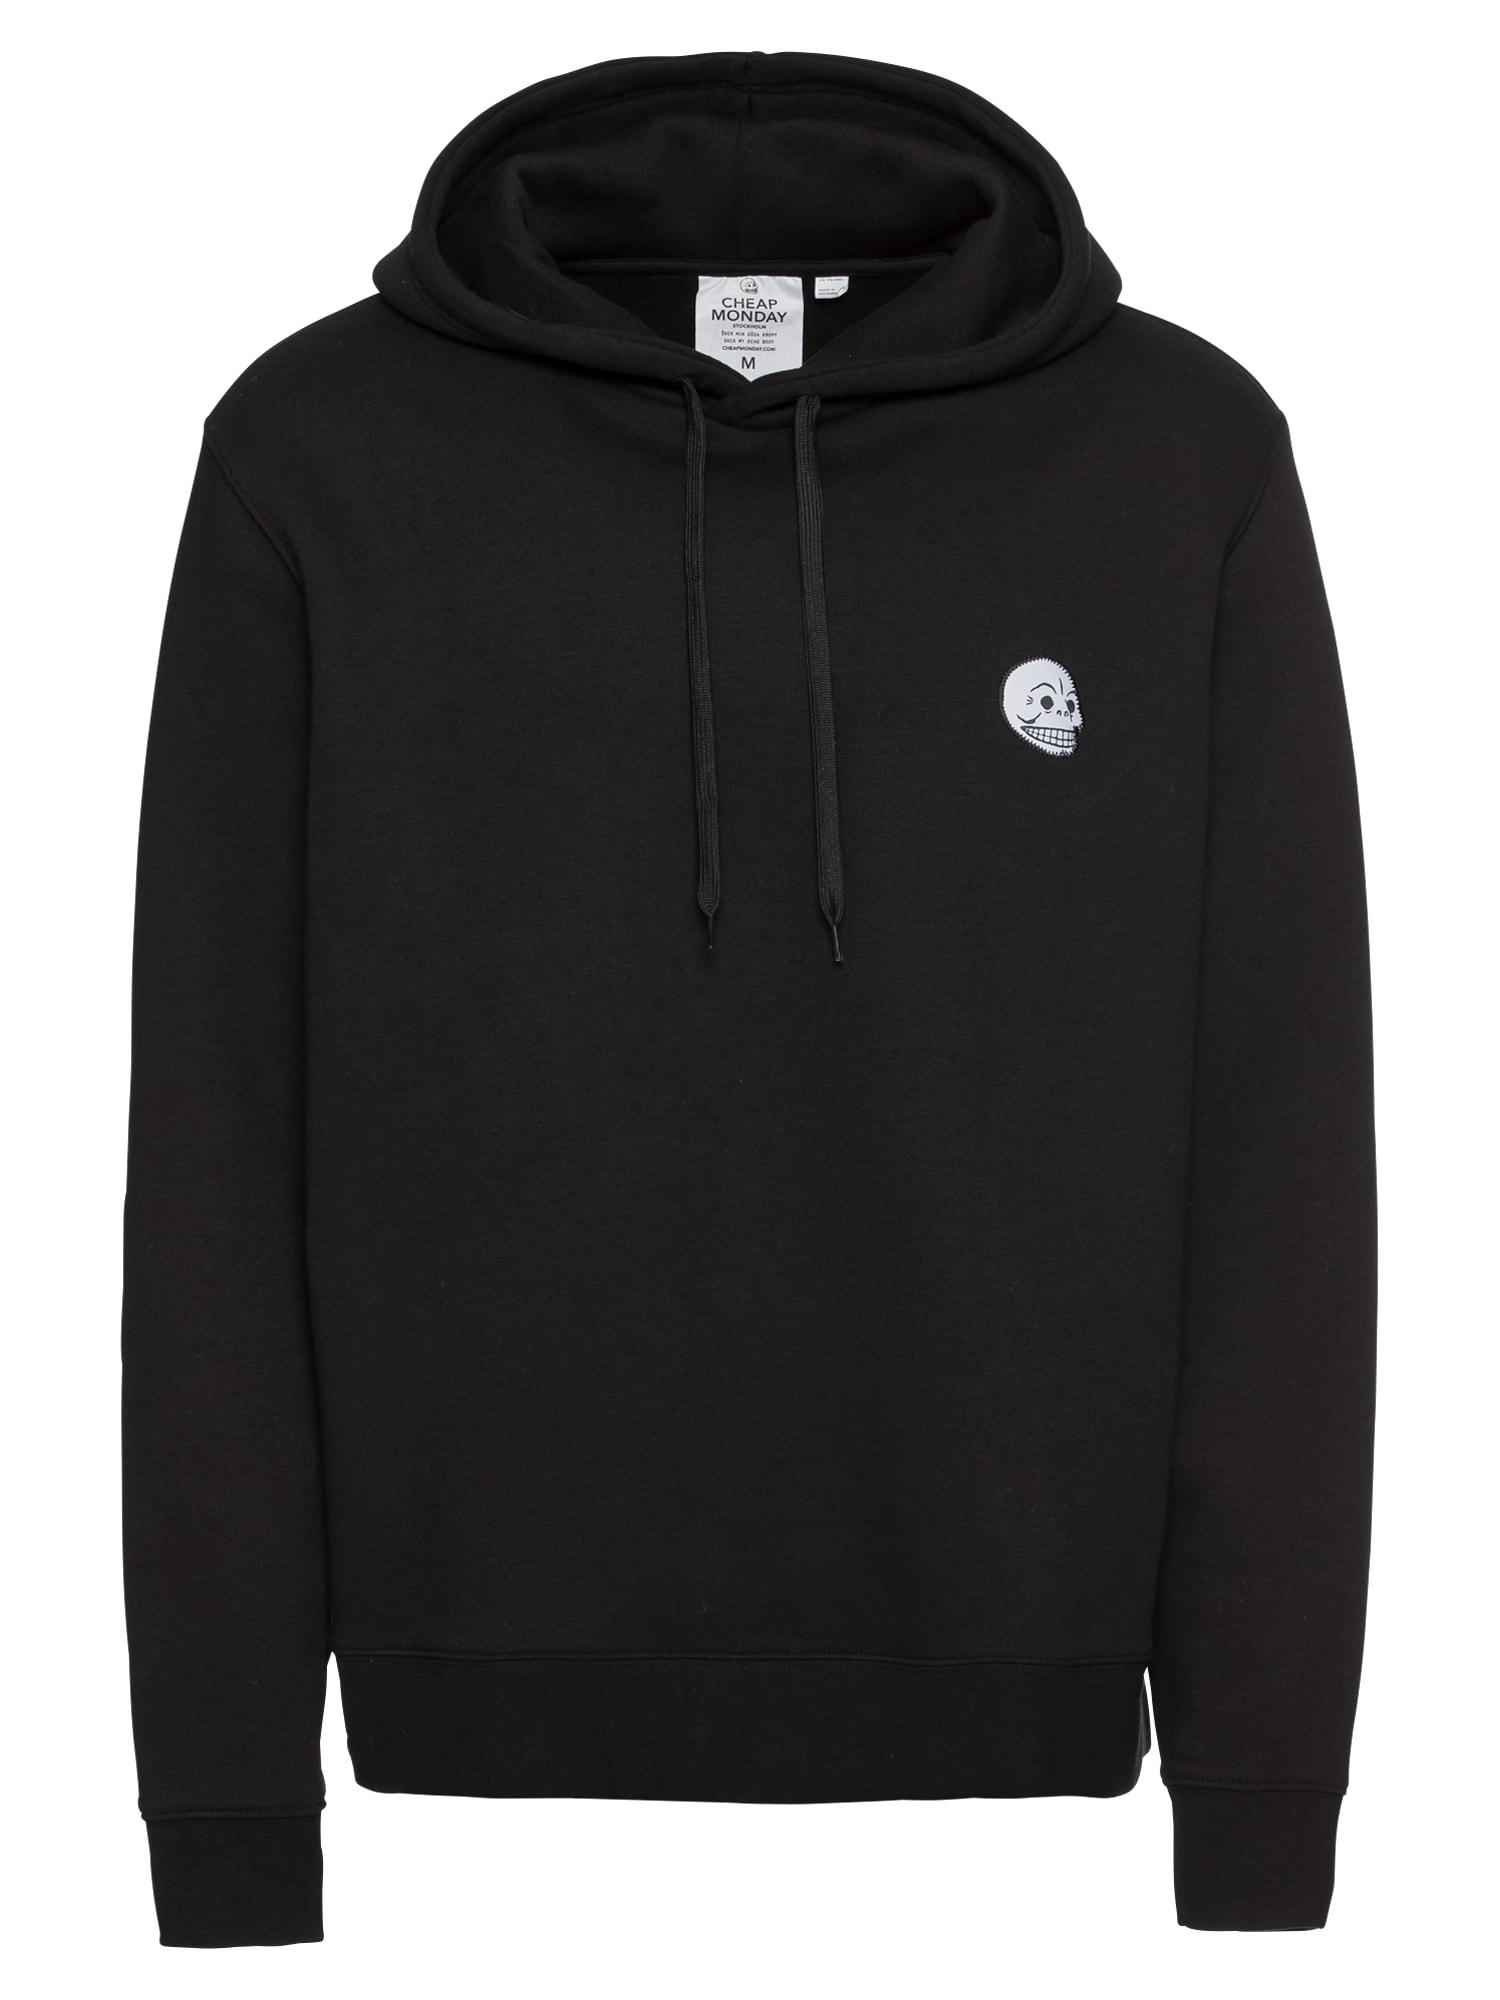 CHEAP MONDAY Heren Sweatshirt Pullover hood Skull badge zwart